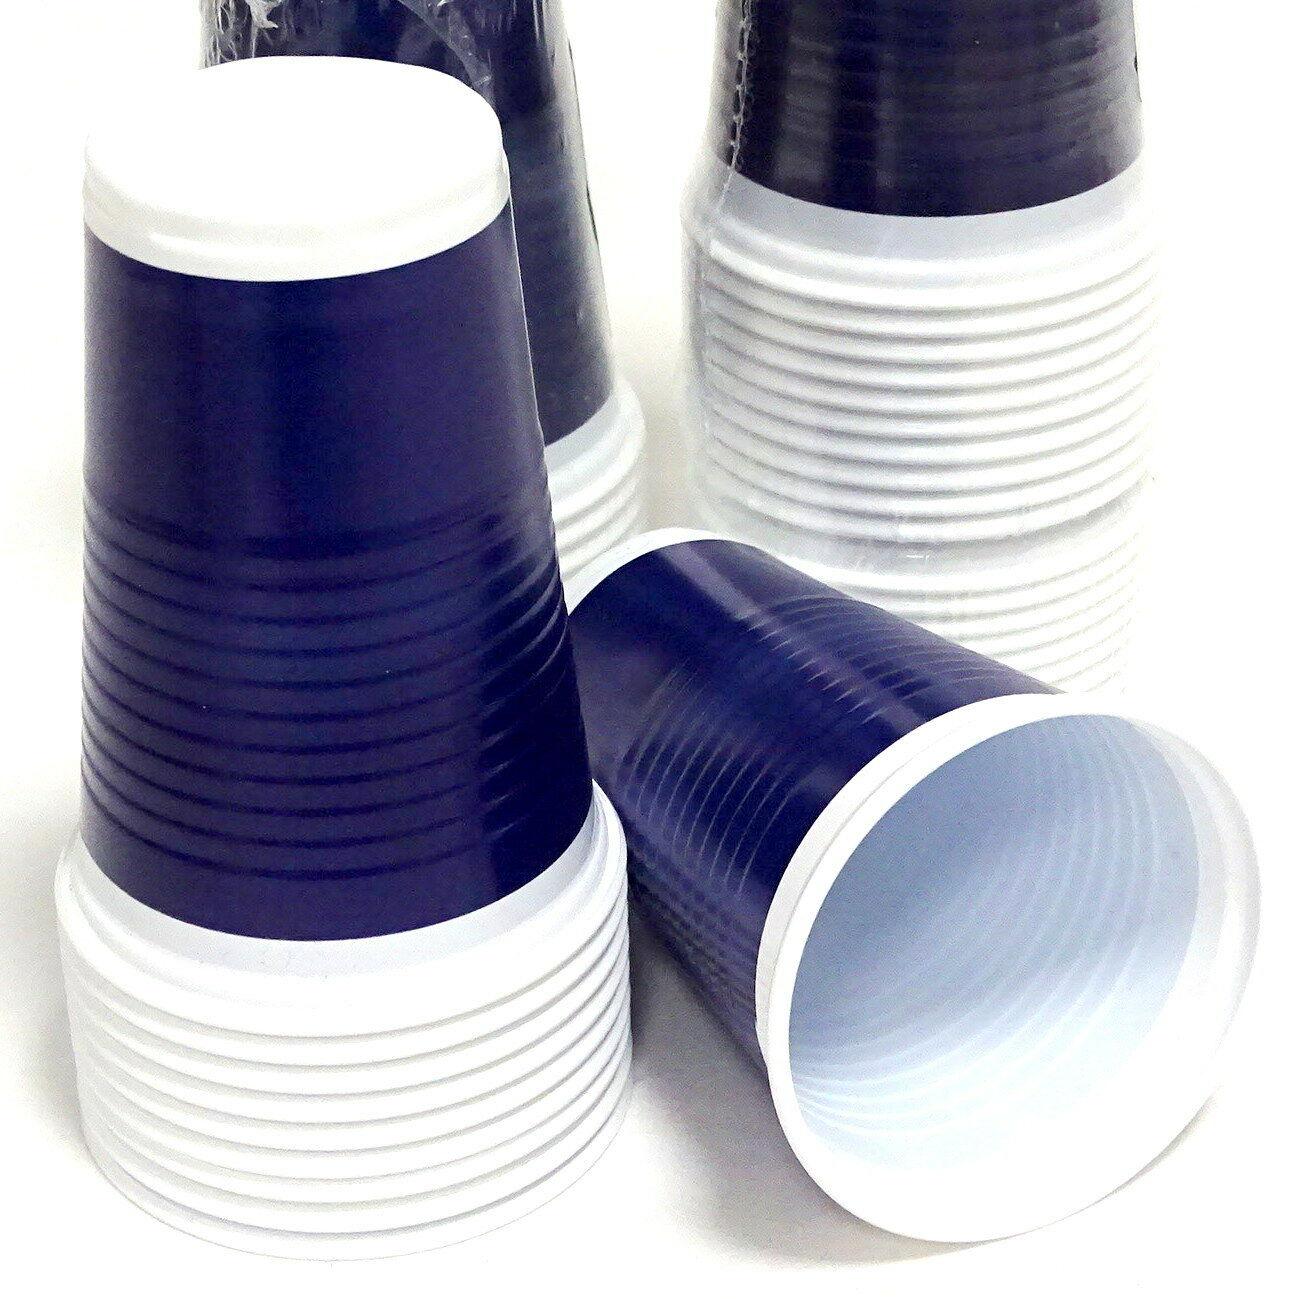 200-3.000 Plastikbecher Einwegbecher 0,2 l Trinkbecher Rot Gelb Blau ab 0,03€/St - 1.000 Stück, Dunkelblau